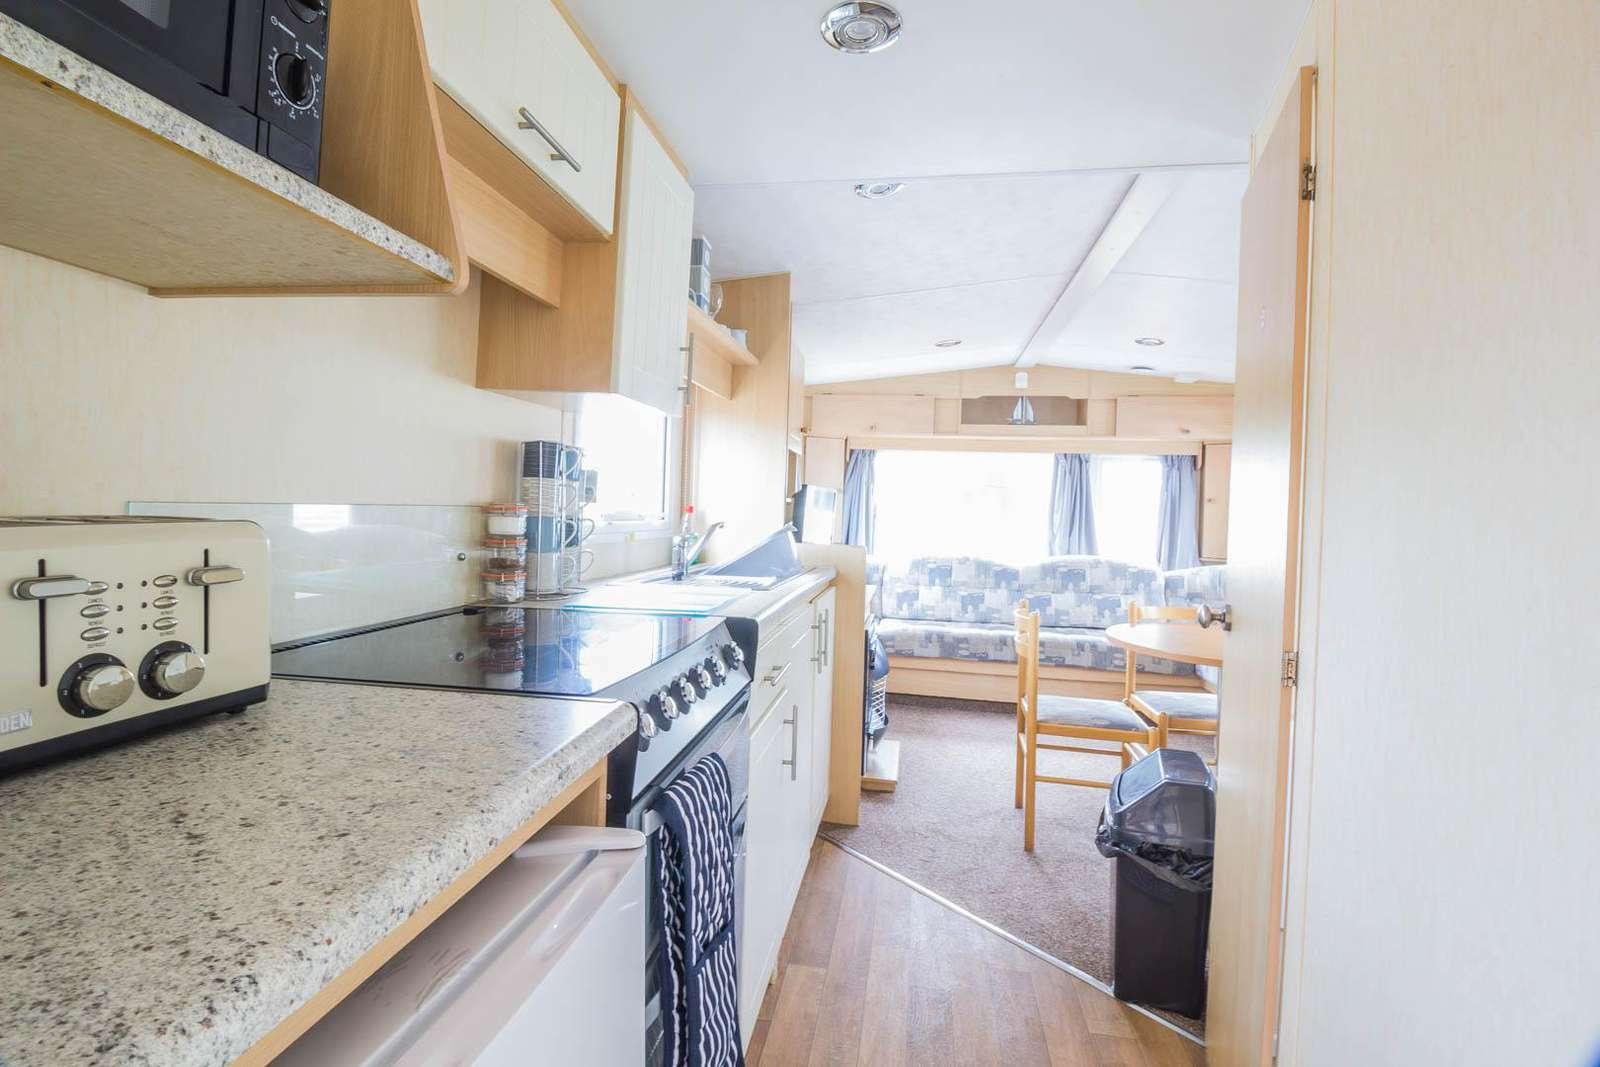 50006D – Dunlin area, 2 bed, 4 berth caravan near park amenities. Emerald Rated. - property